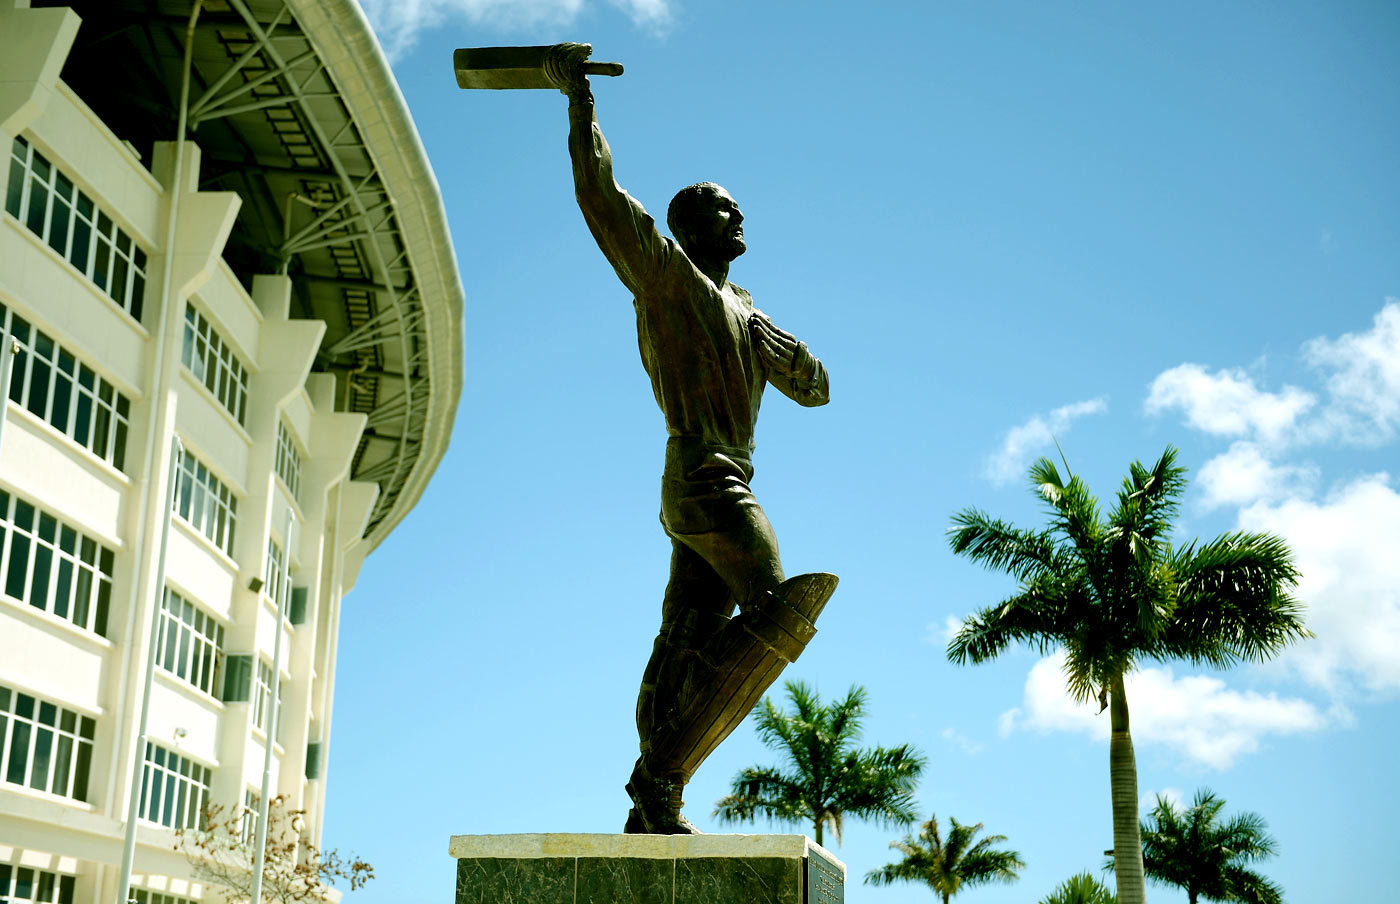 A statue of Viv Richards outside the Sir Vivian Richards Stadium in Antigua